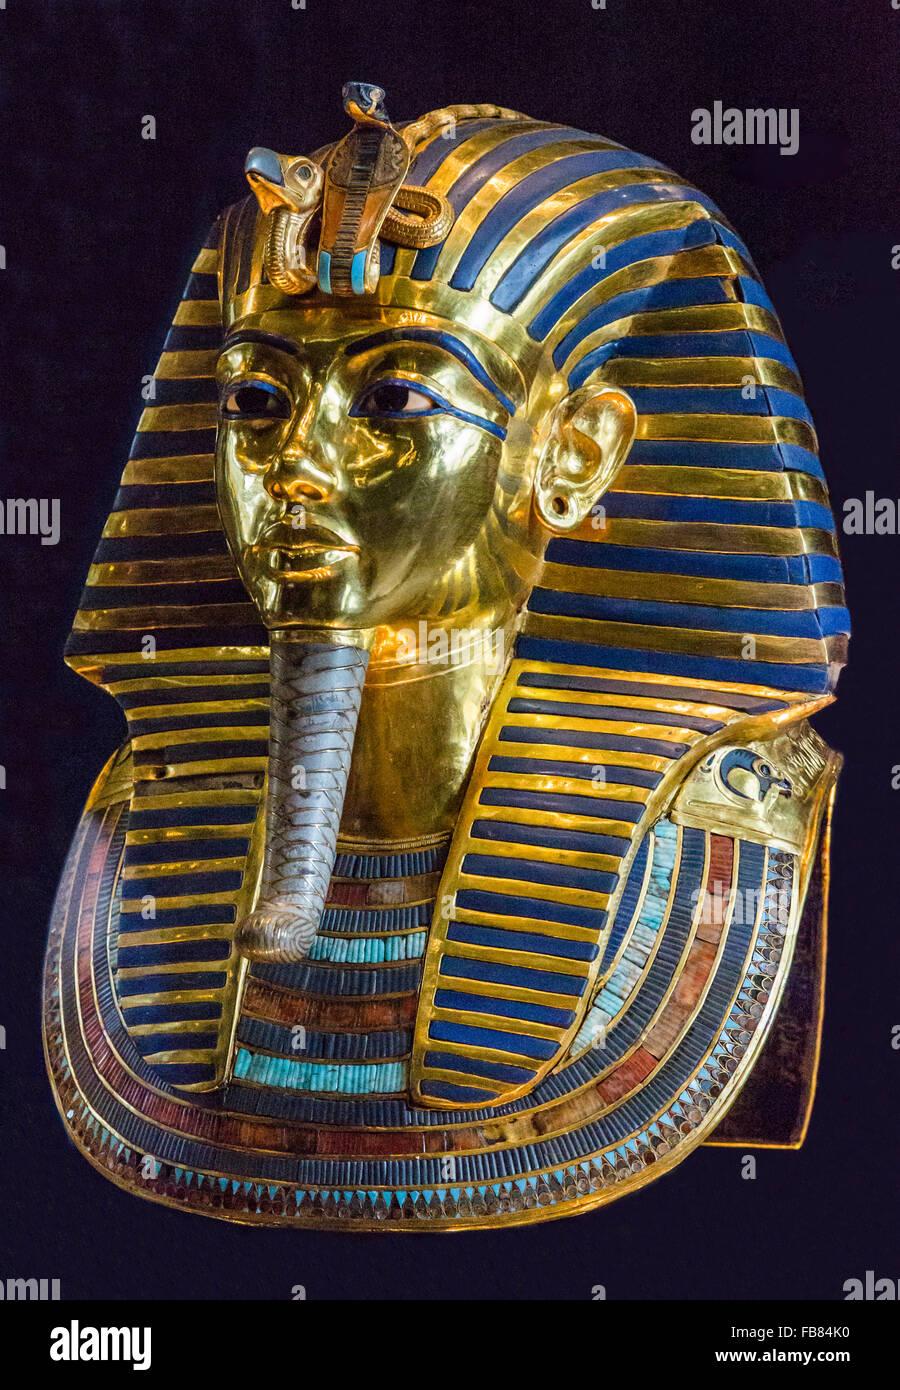 Tutankhamun's mask from the tomb of Tutankhamun at the Egyptian Museum, Cairo, Egypt - Stock Image